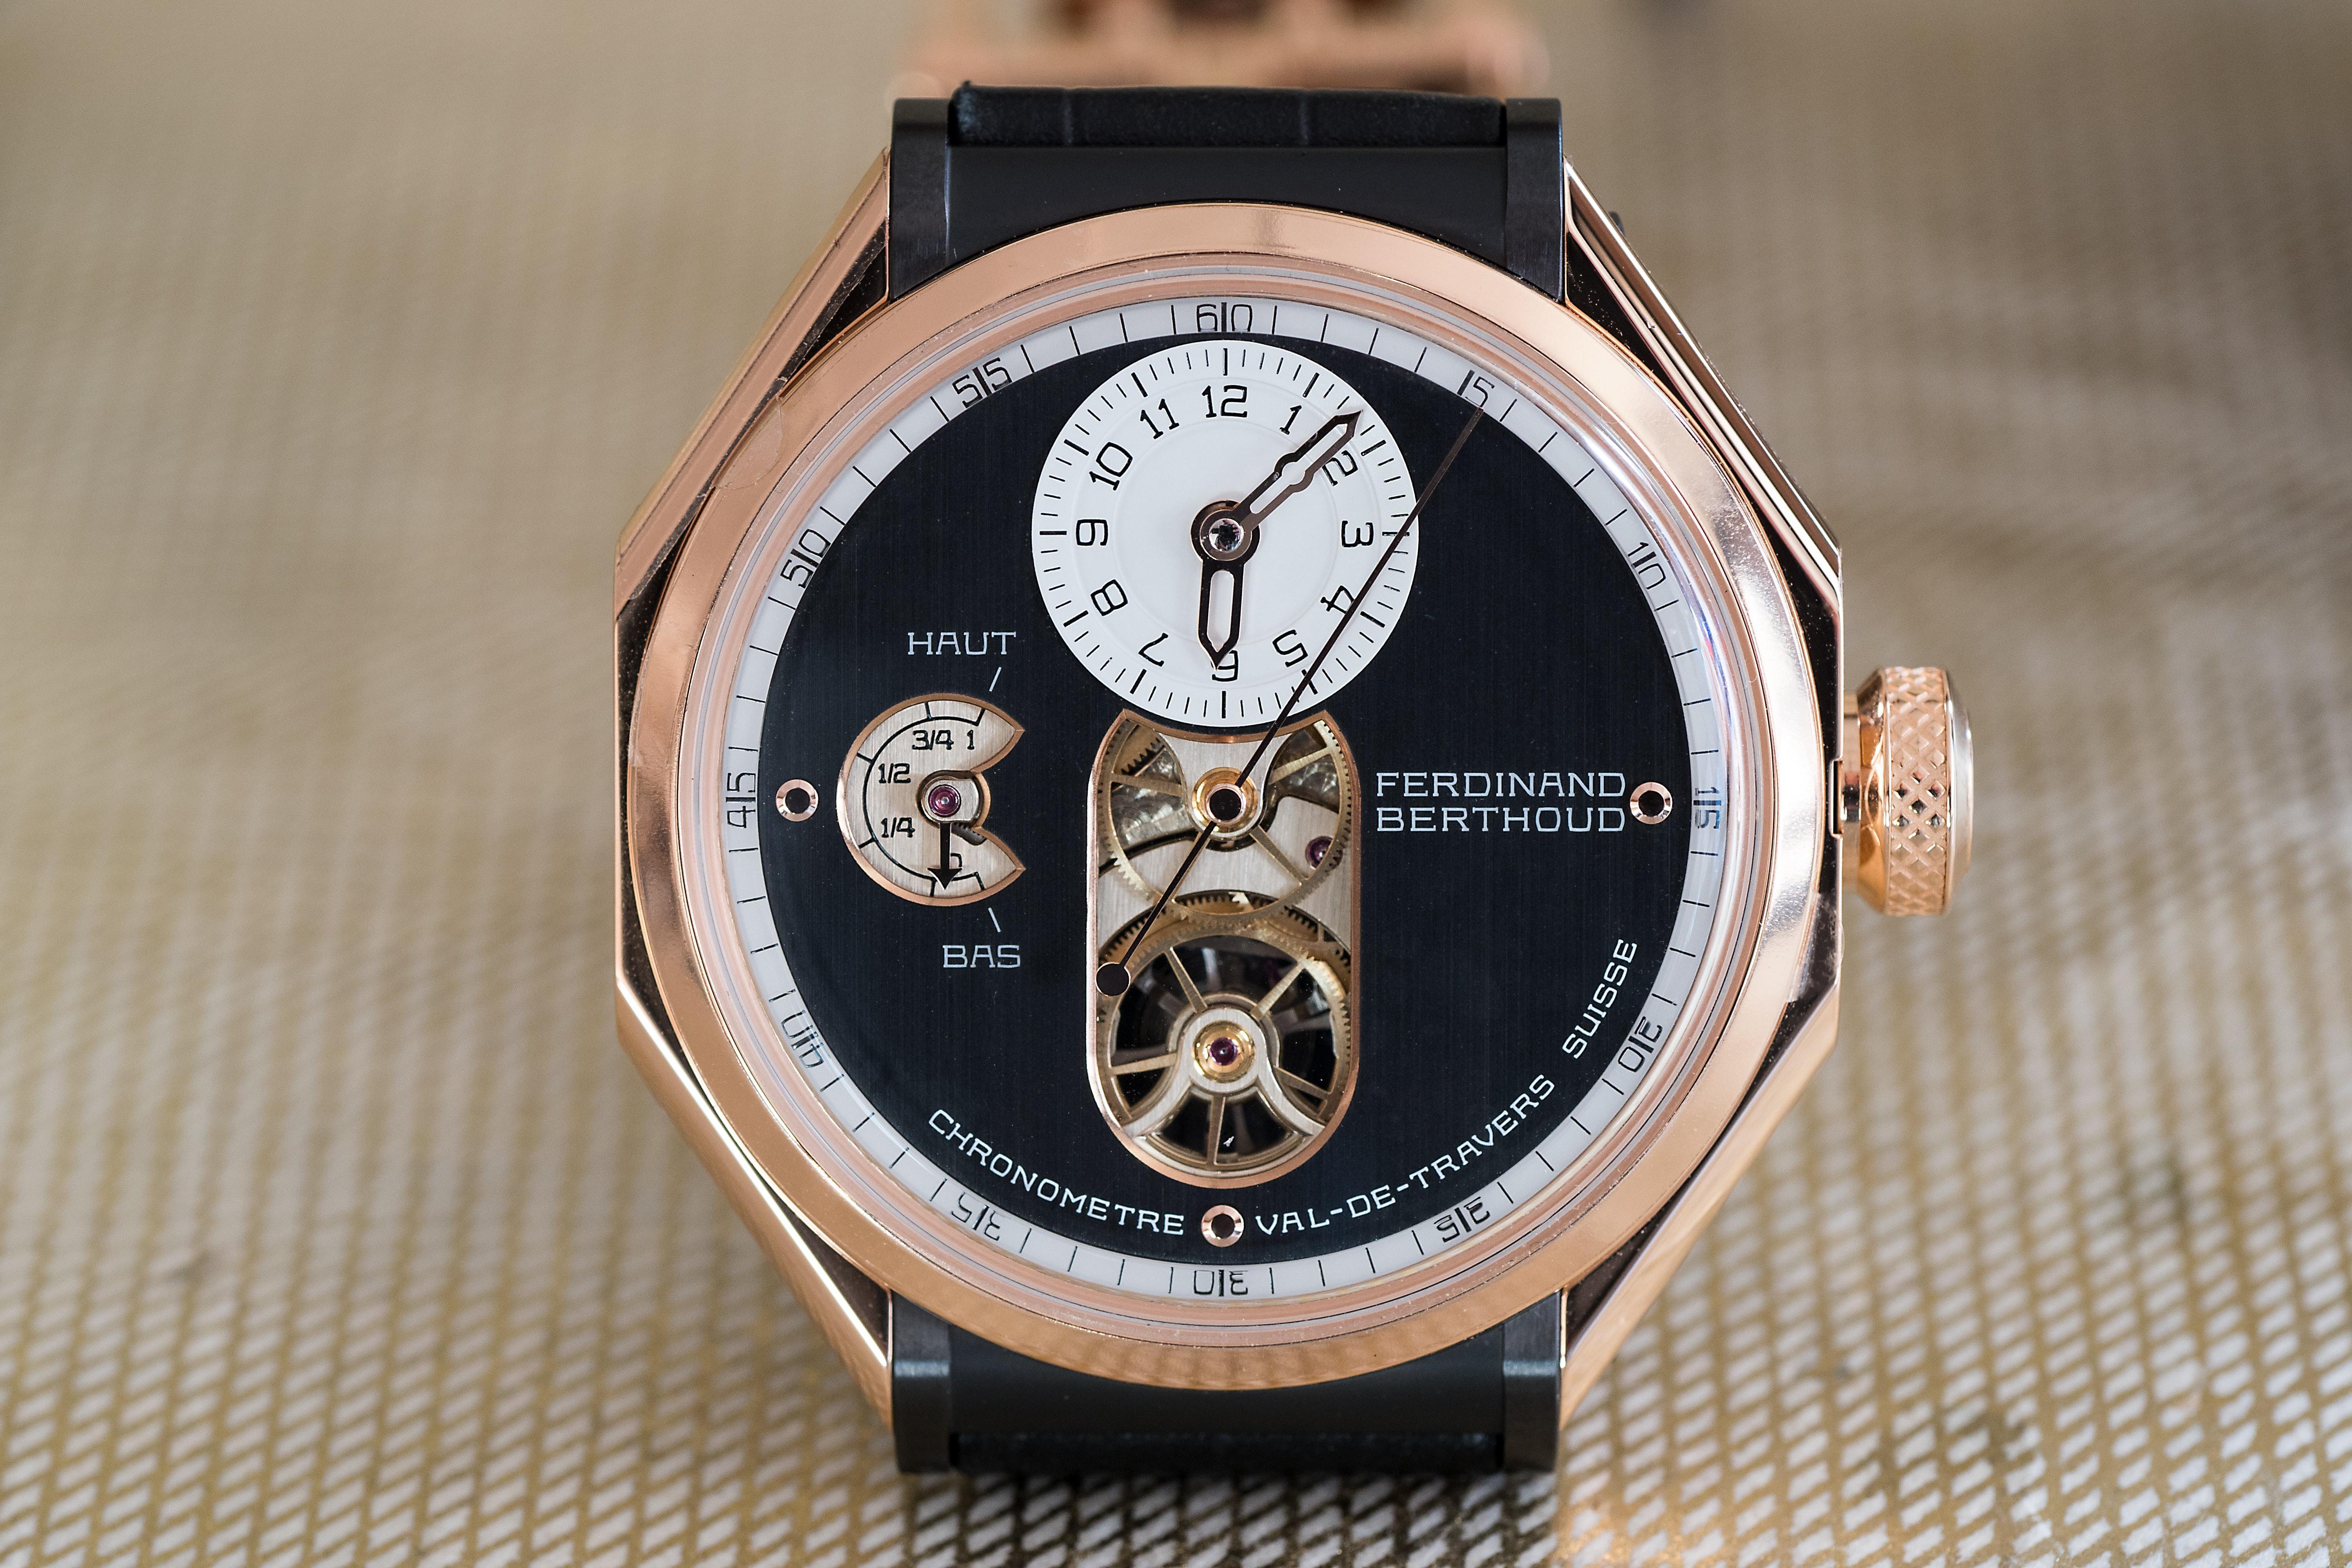 Ferdinand Berthoud Chronomtre FB 1  A Week On The Wrist: The Ferdinand Berthoud Chronomtre FB 1 P6120253